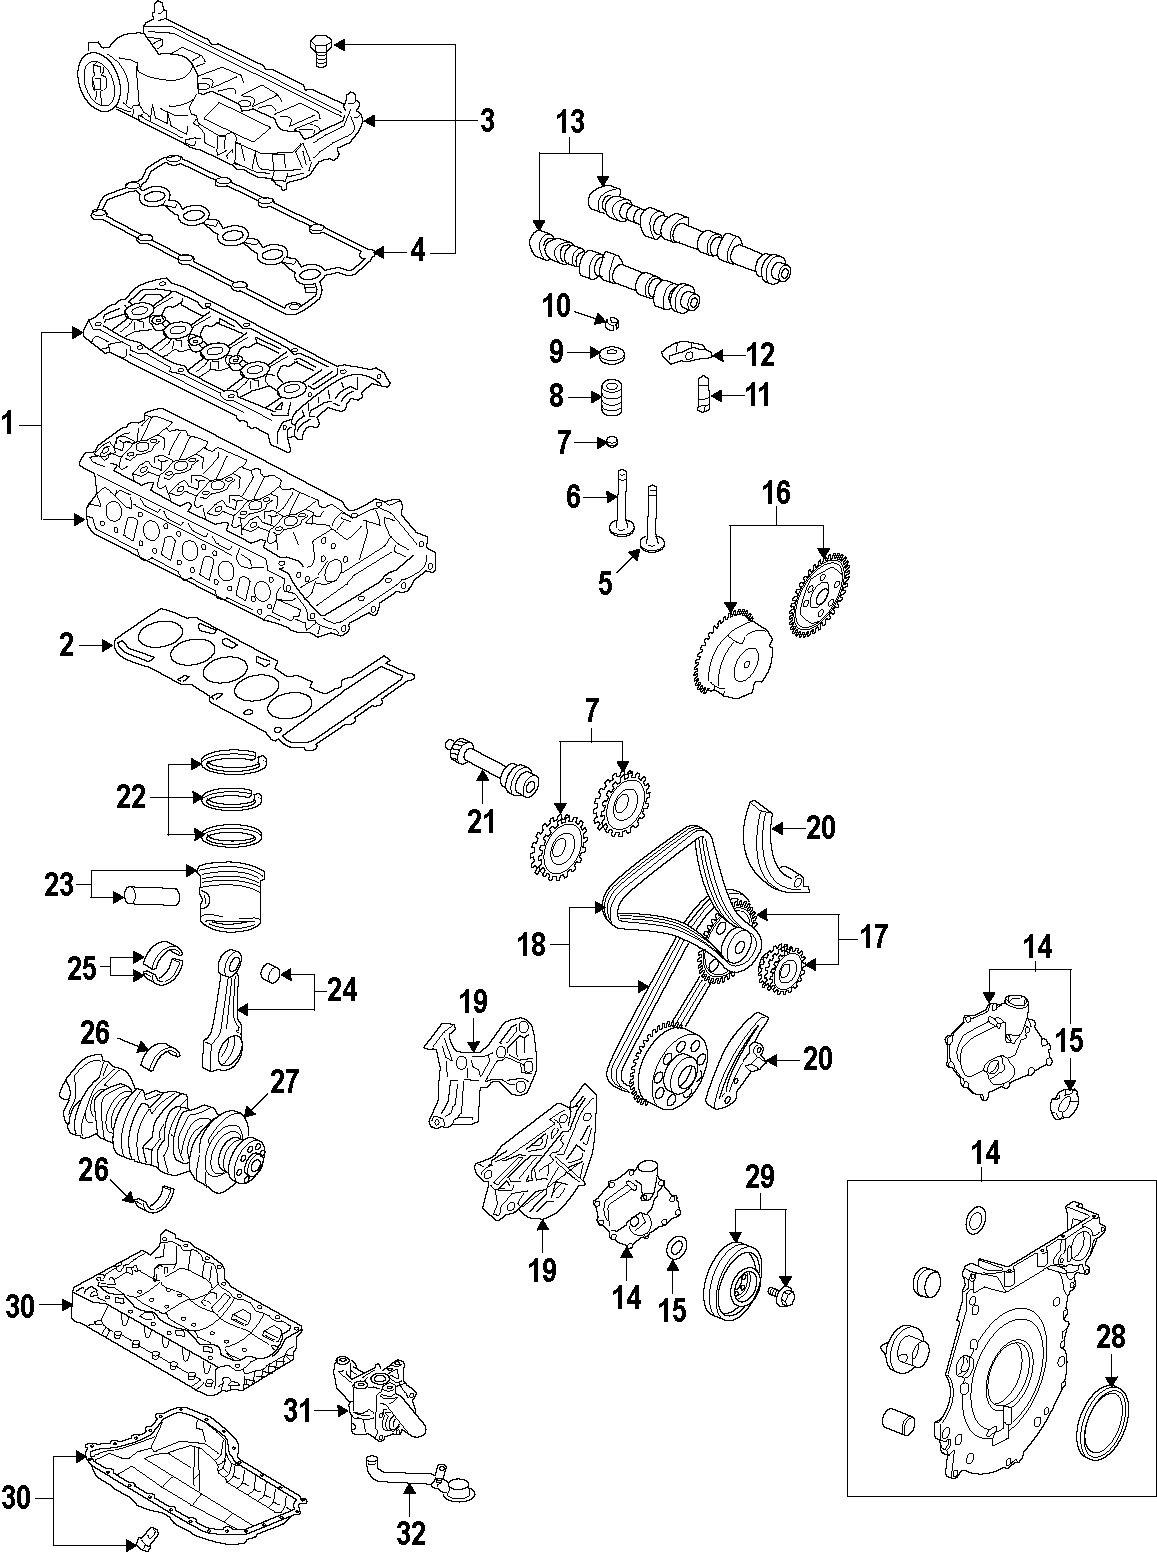 1600cc Vw Engine Heads | Wiring Diagram Database